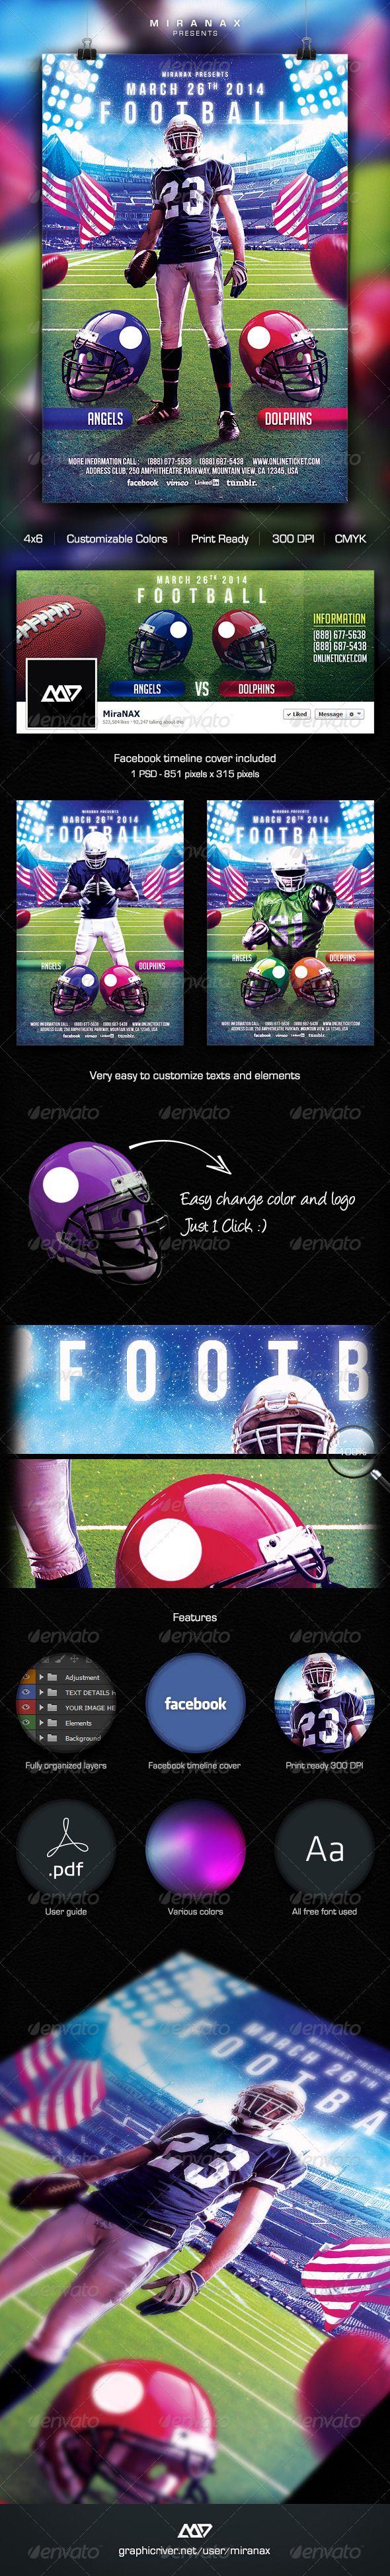 college bowl game scores college football logos